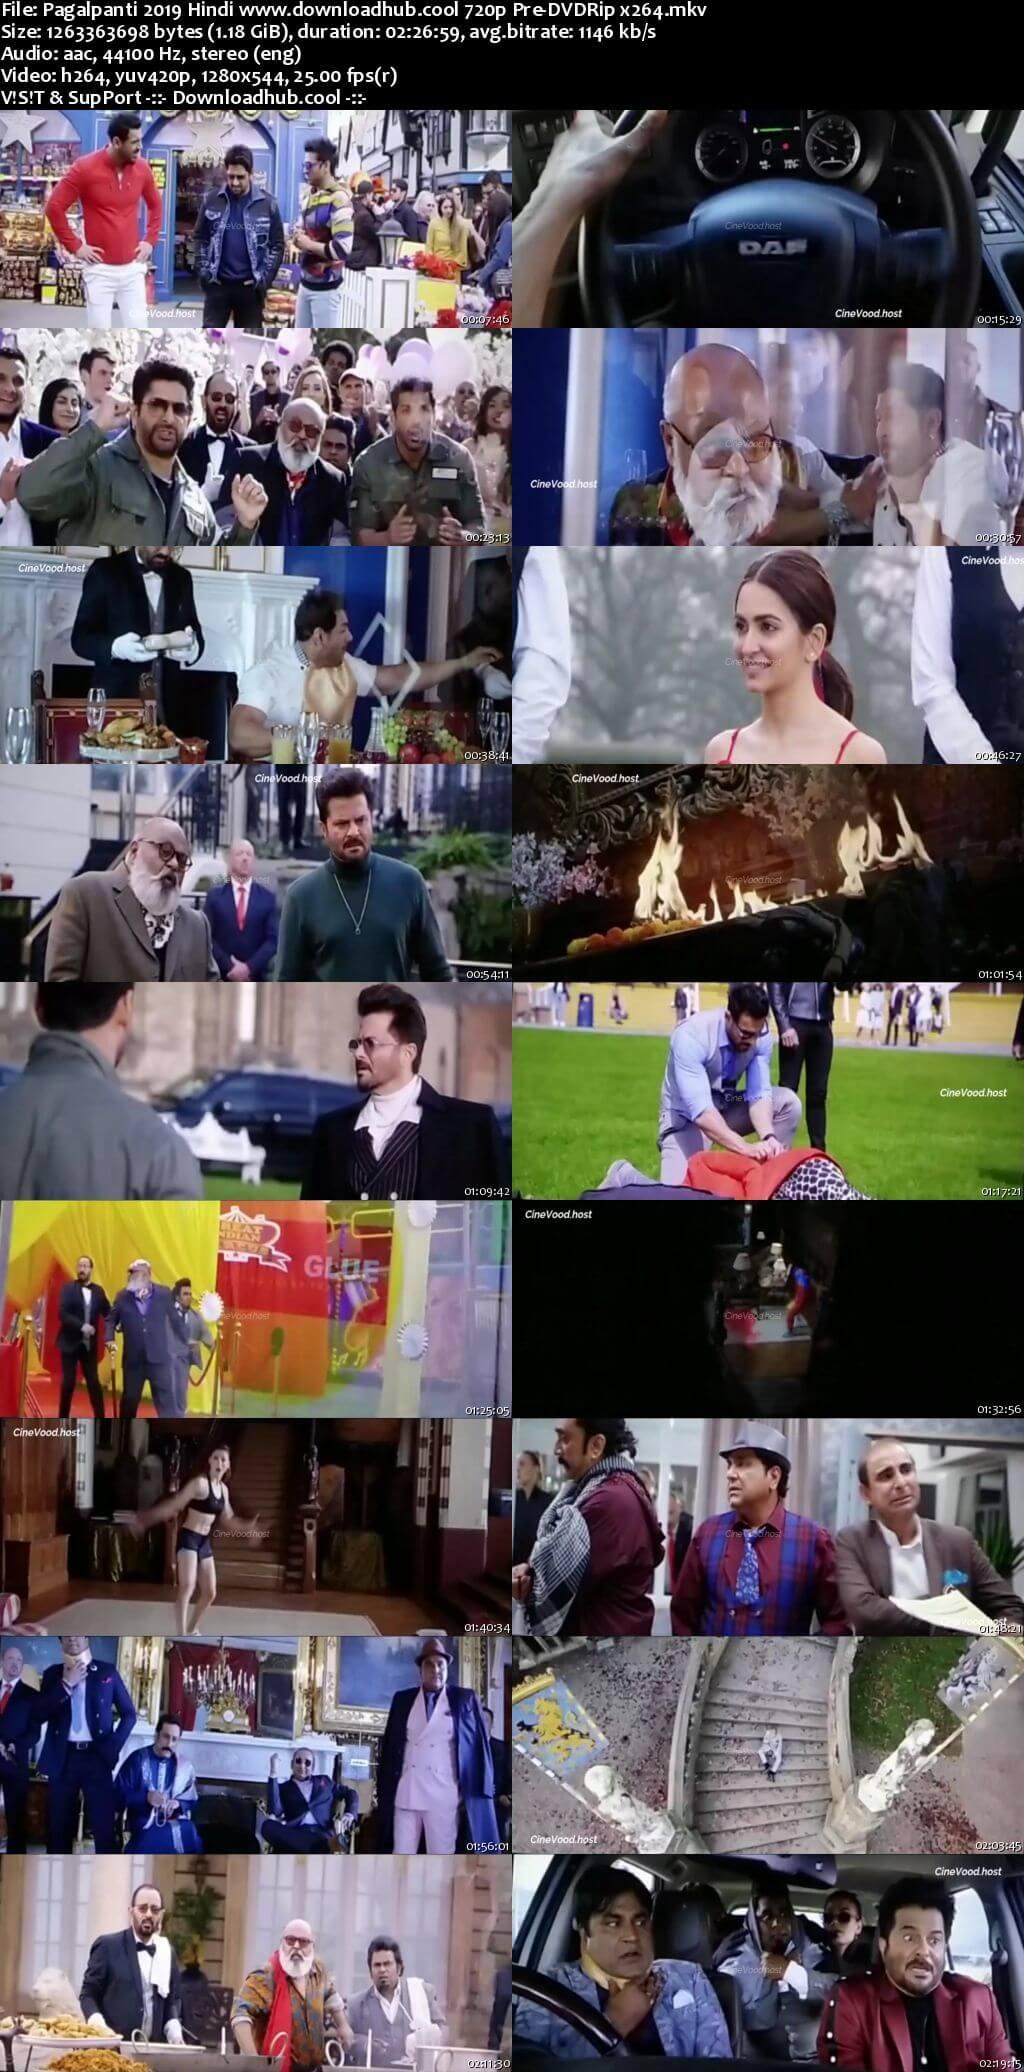 Pagalpanti 2019 Hindi 720p 480p Pre-DVDRip x264